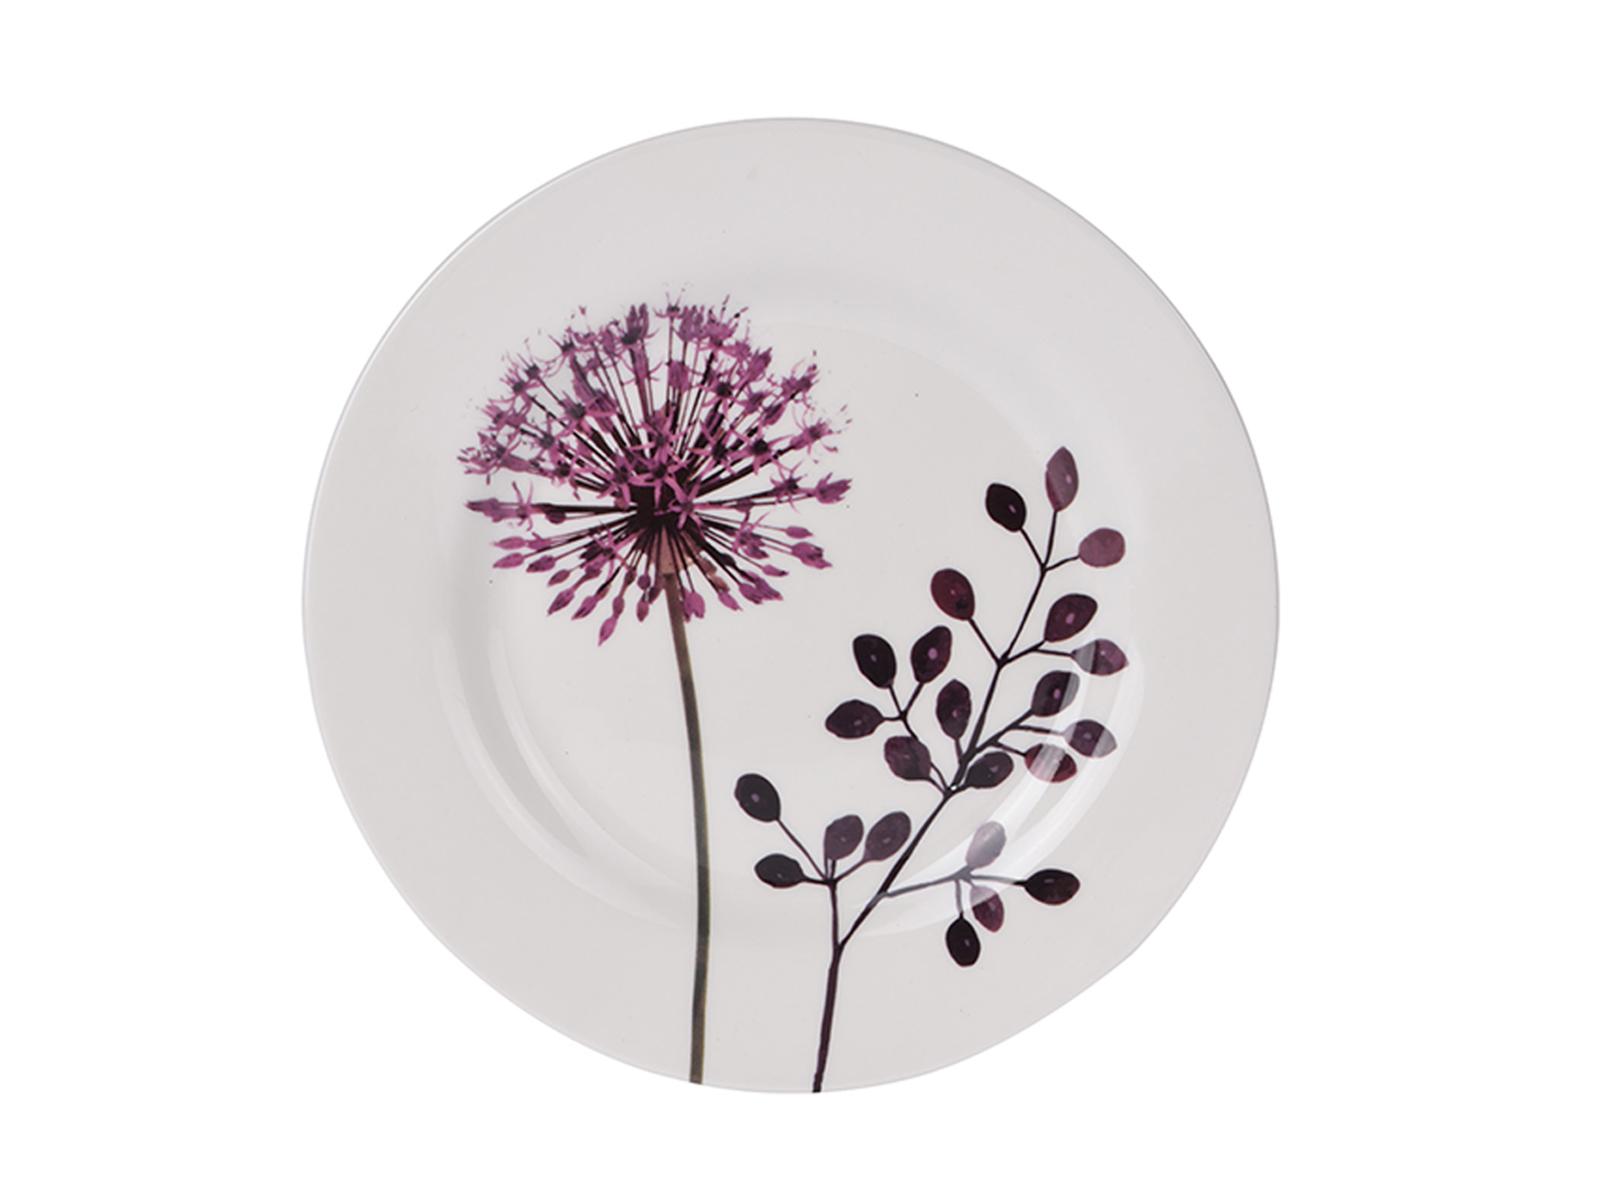 Тарелка FlowerПосуда<br>Тарелка для горячего<br>